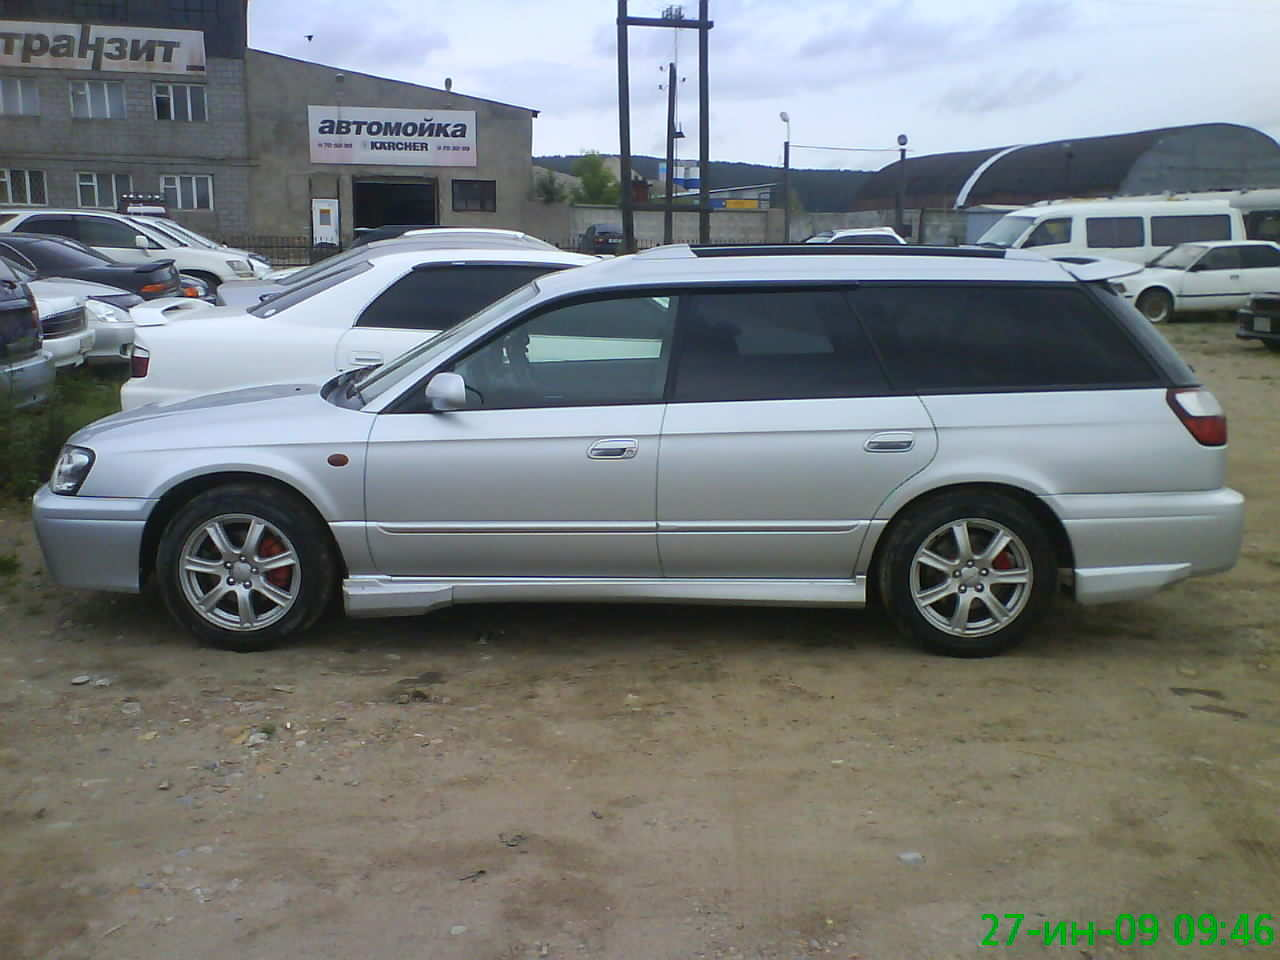 2002 subaru legacy wagon photos 2 0 gasoline automatic. Black Bedroom Furniture Sets. Home Design Ideas